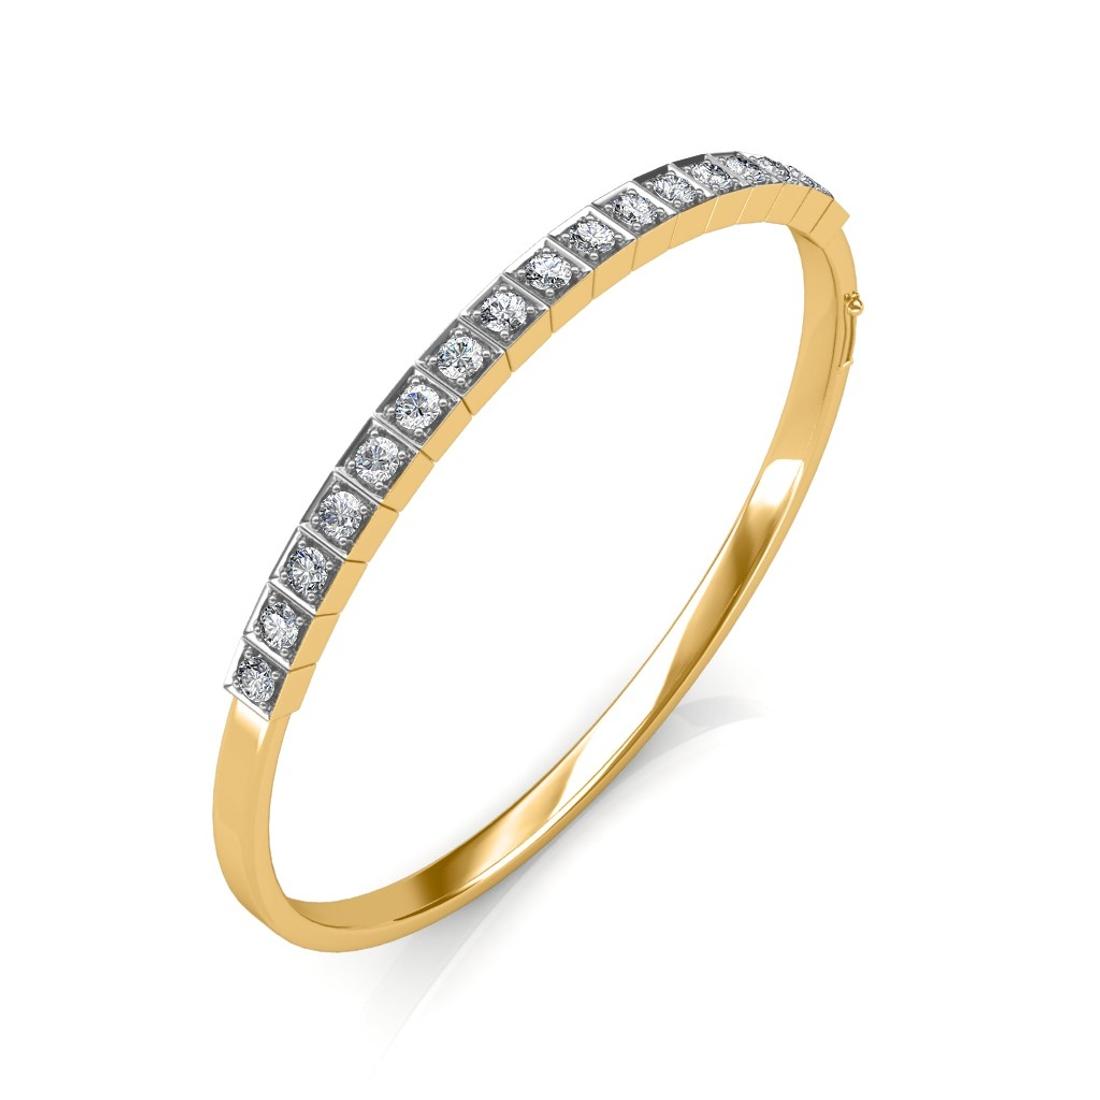 Sarvada Jewels' The Marie Bracelet